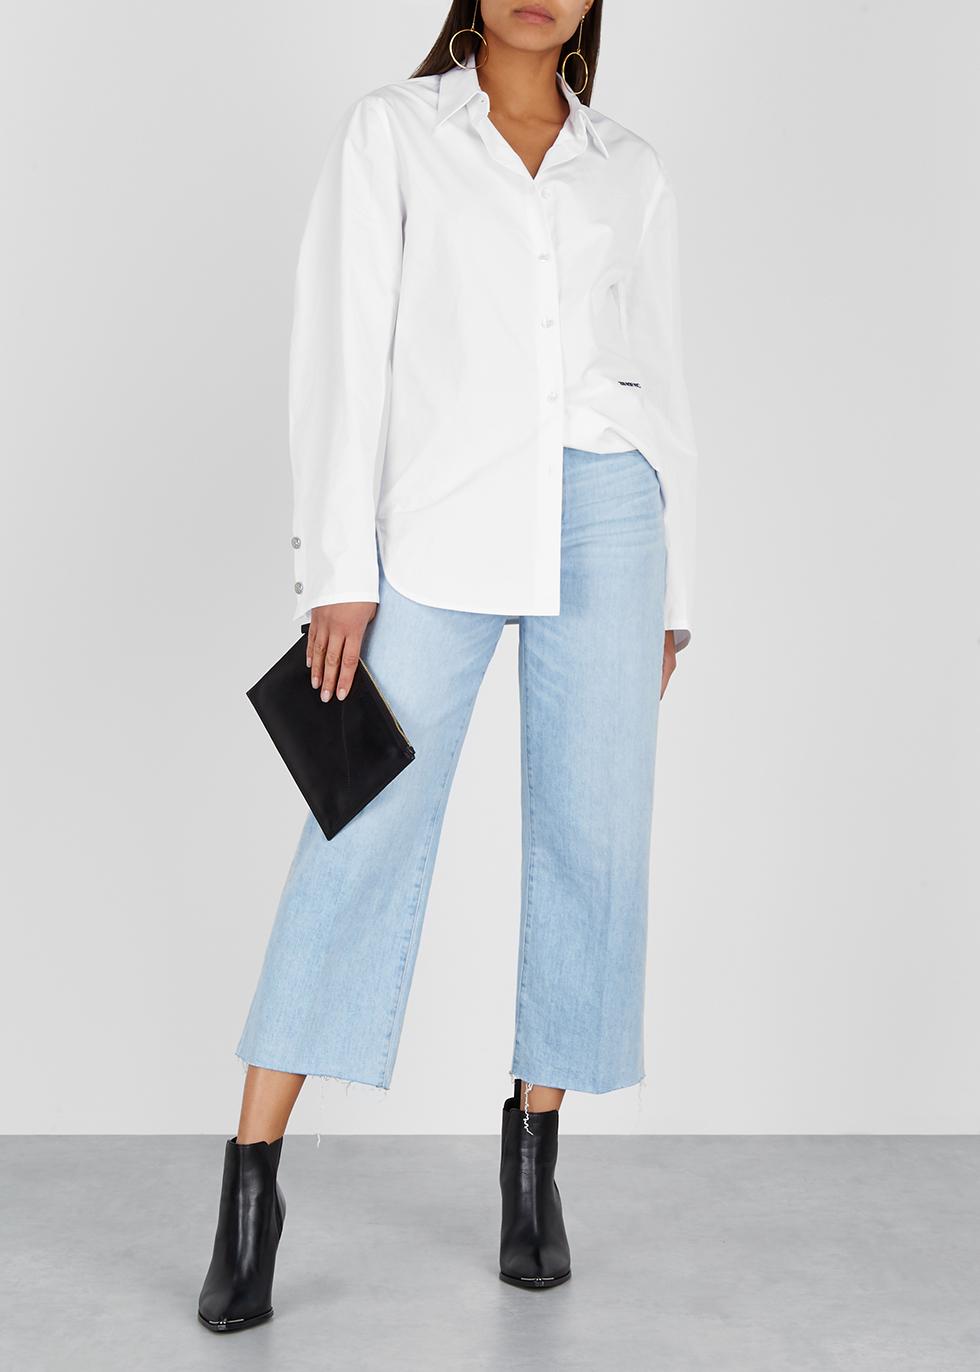 Nellie blue cropped wide-leg jeans - Paige